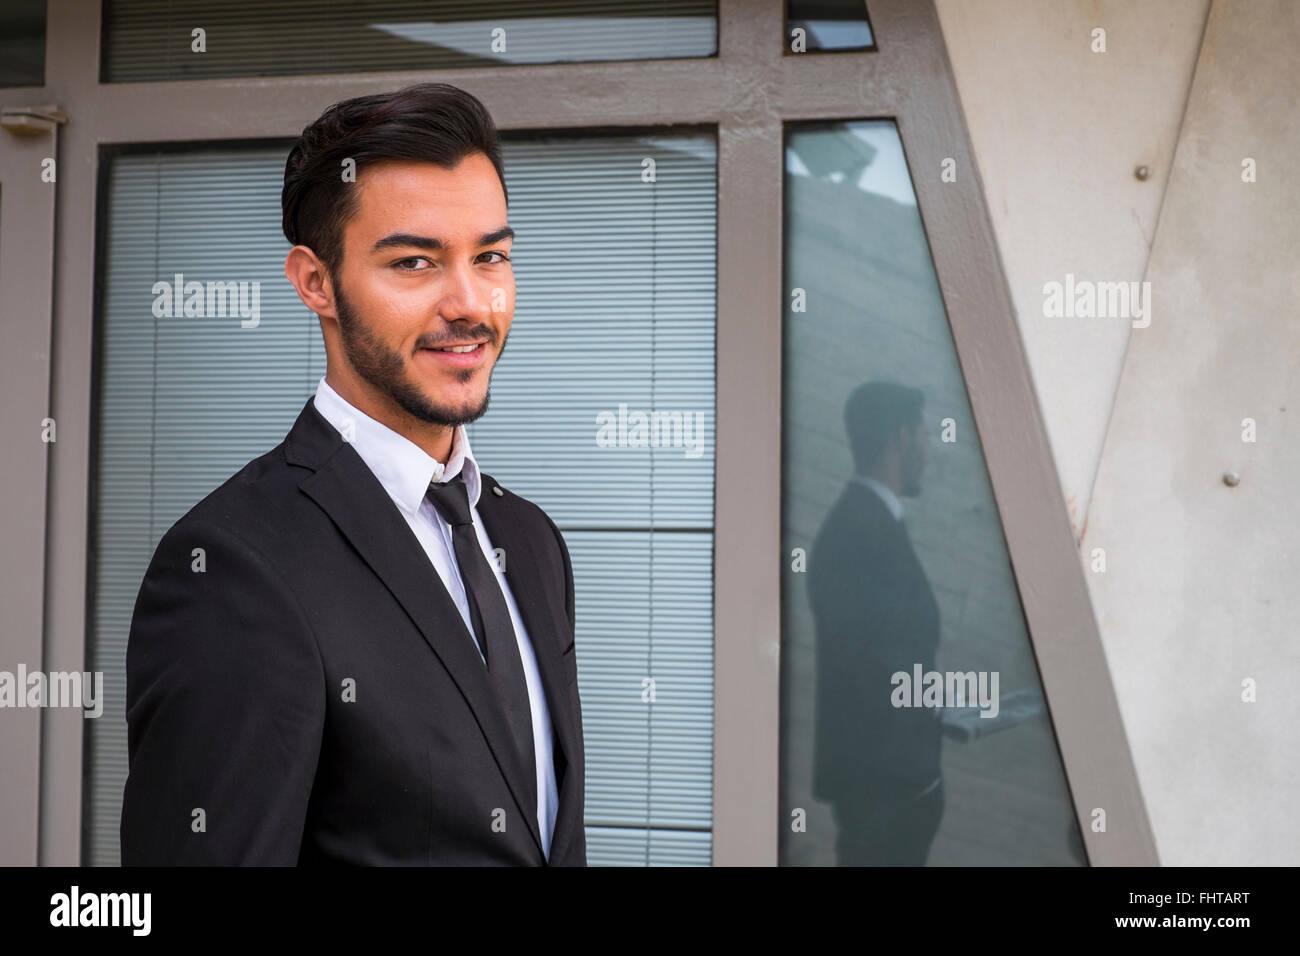 Black Suit Beard Stock Photos & Black Suit Beard Stock Images - Alamy